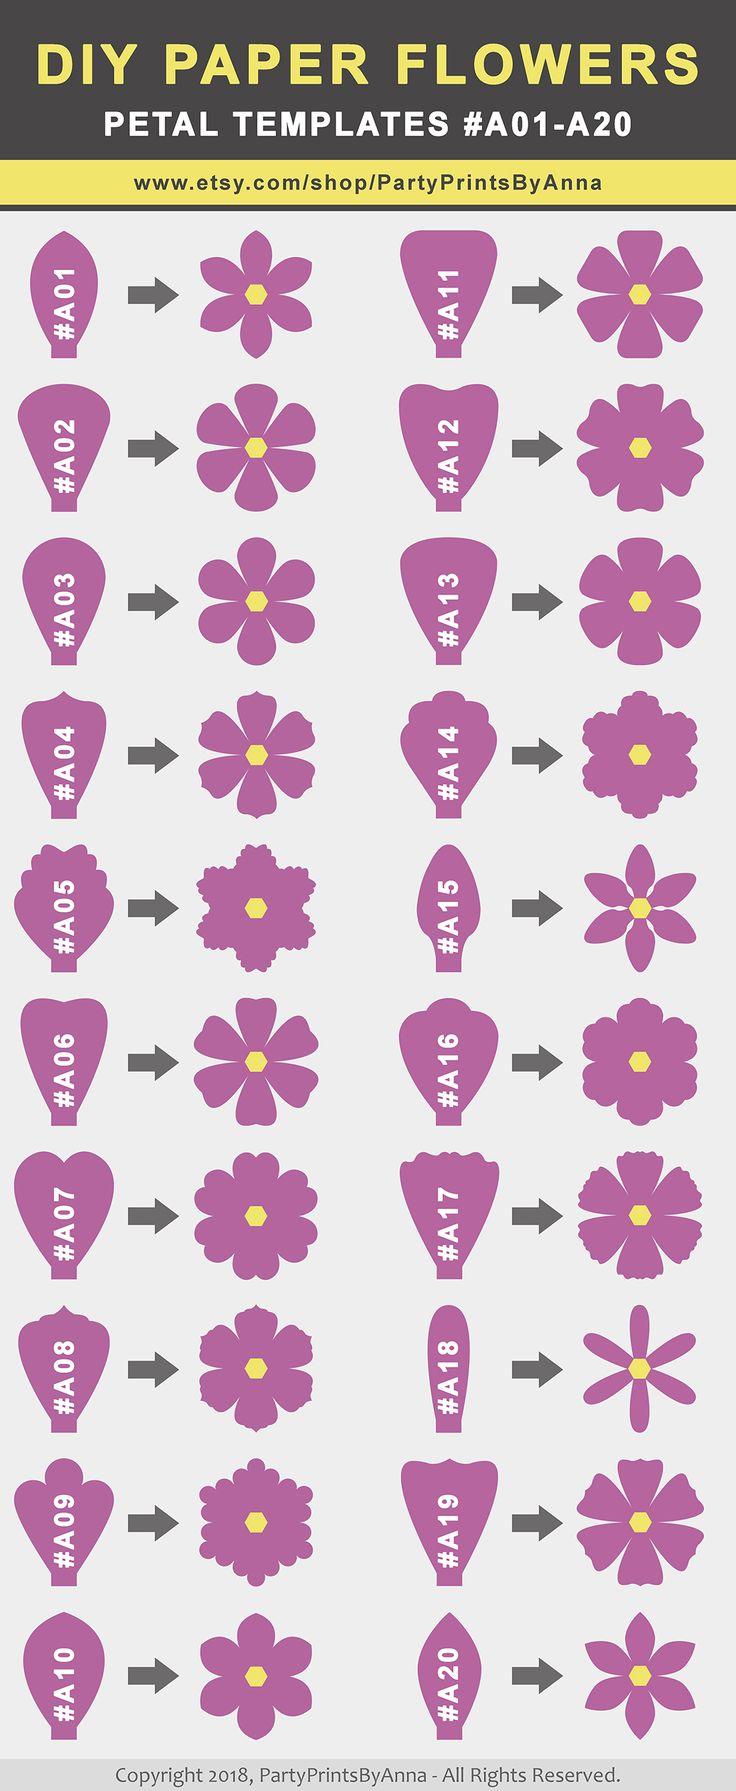 PAPER FLOWER PETALS - TEMPLATES #A01-A40 #PaperFlowers, #PaperFlowerTemplates, #SvgFlowerTemplates #SvgFlowerPetals #DIYPaperFlowers #DIYFlowerBackdrop